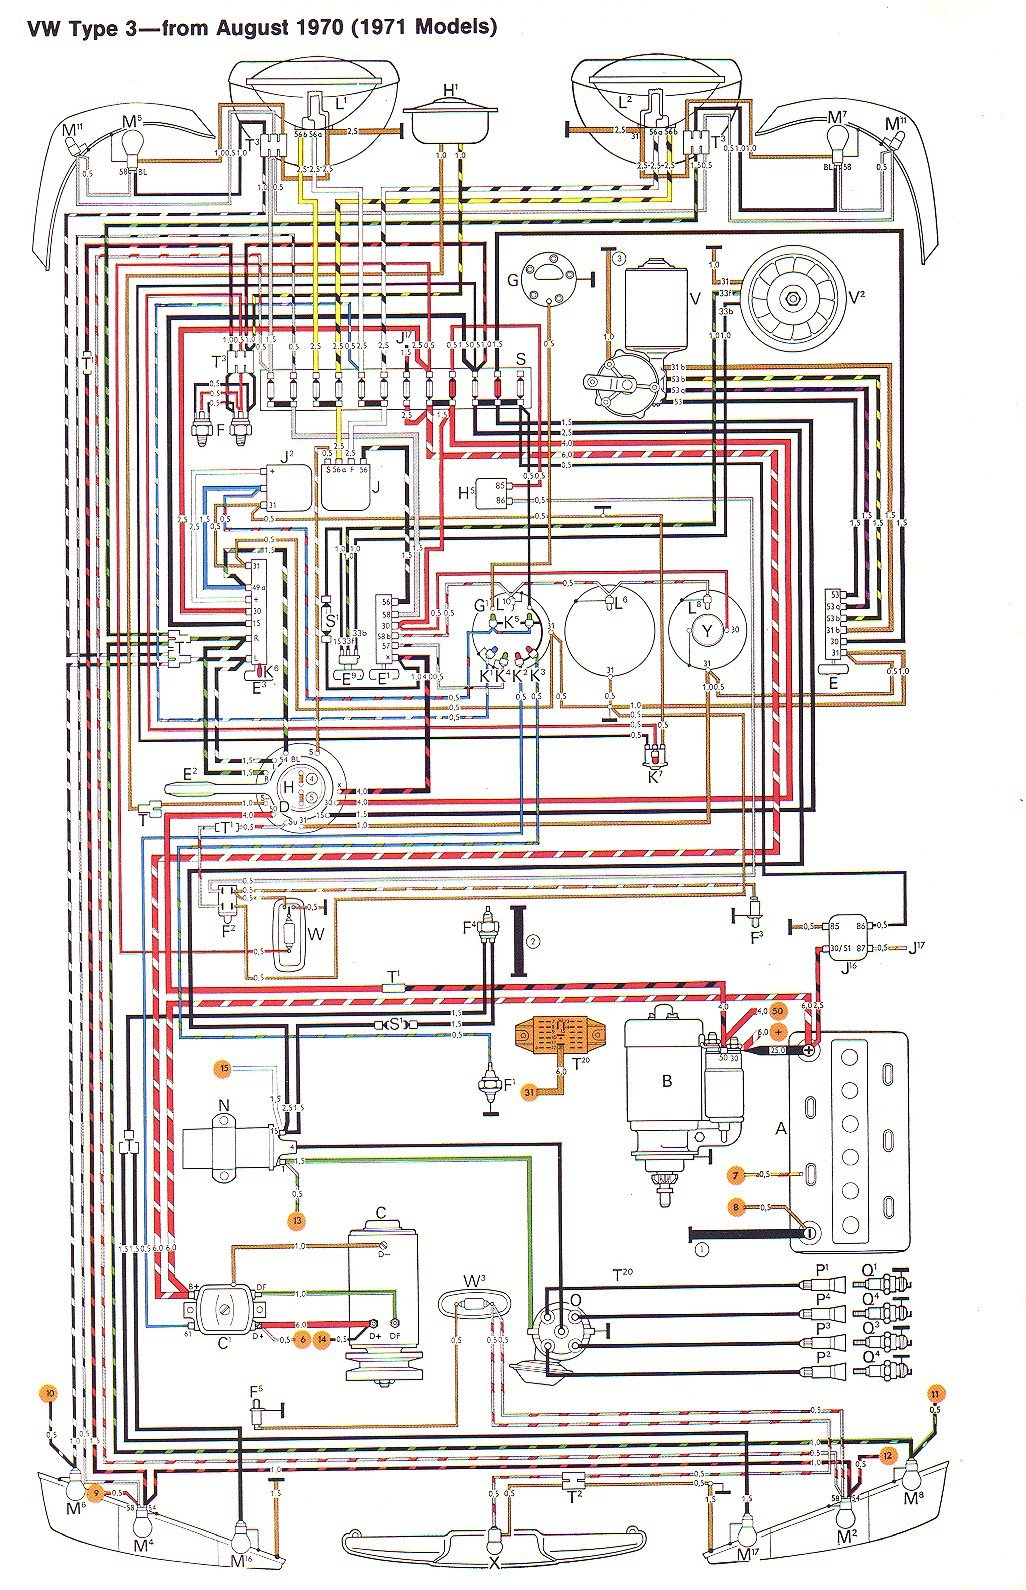 Vw Type 3 Wiring Diagrams - Model A Wiring Diagram